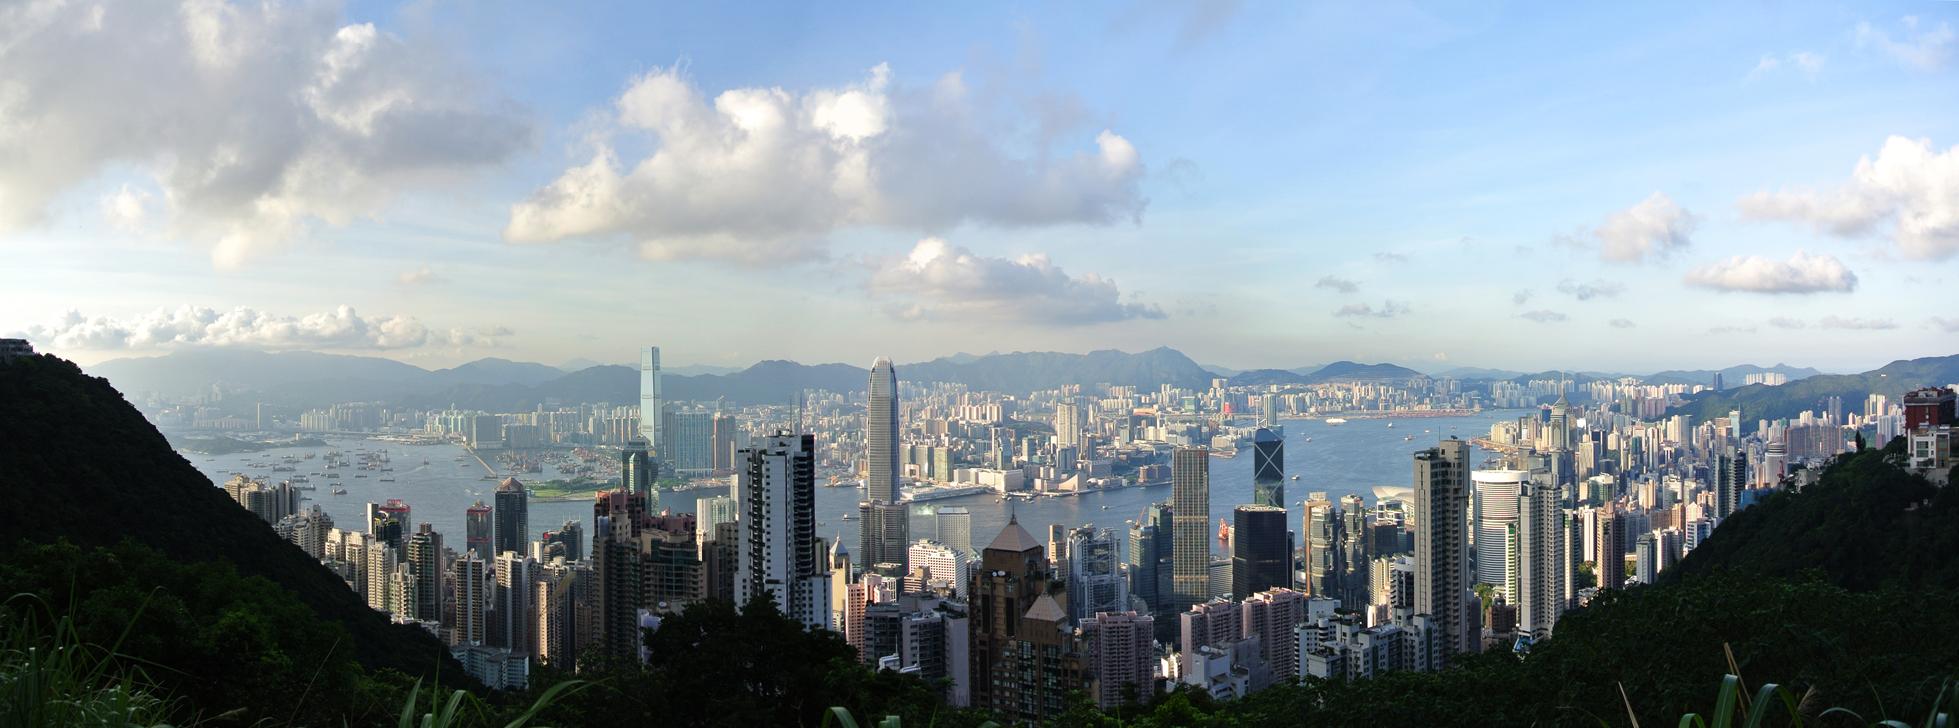 The awe-inspiring panorama of Hong Kong.